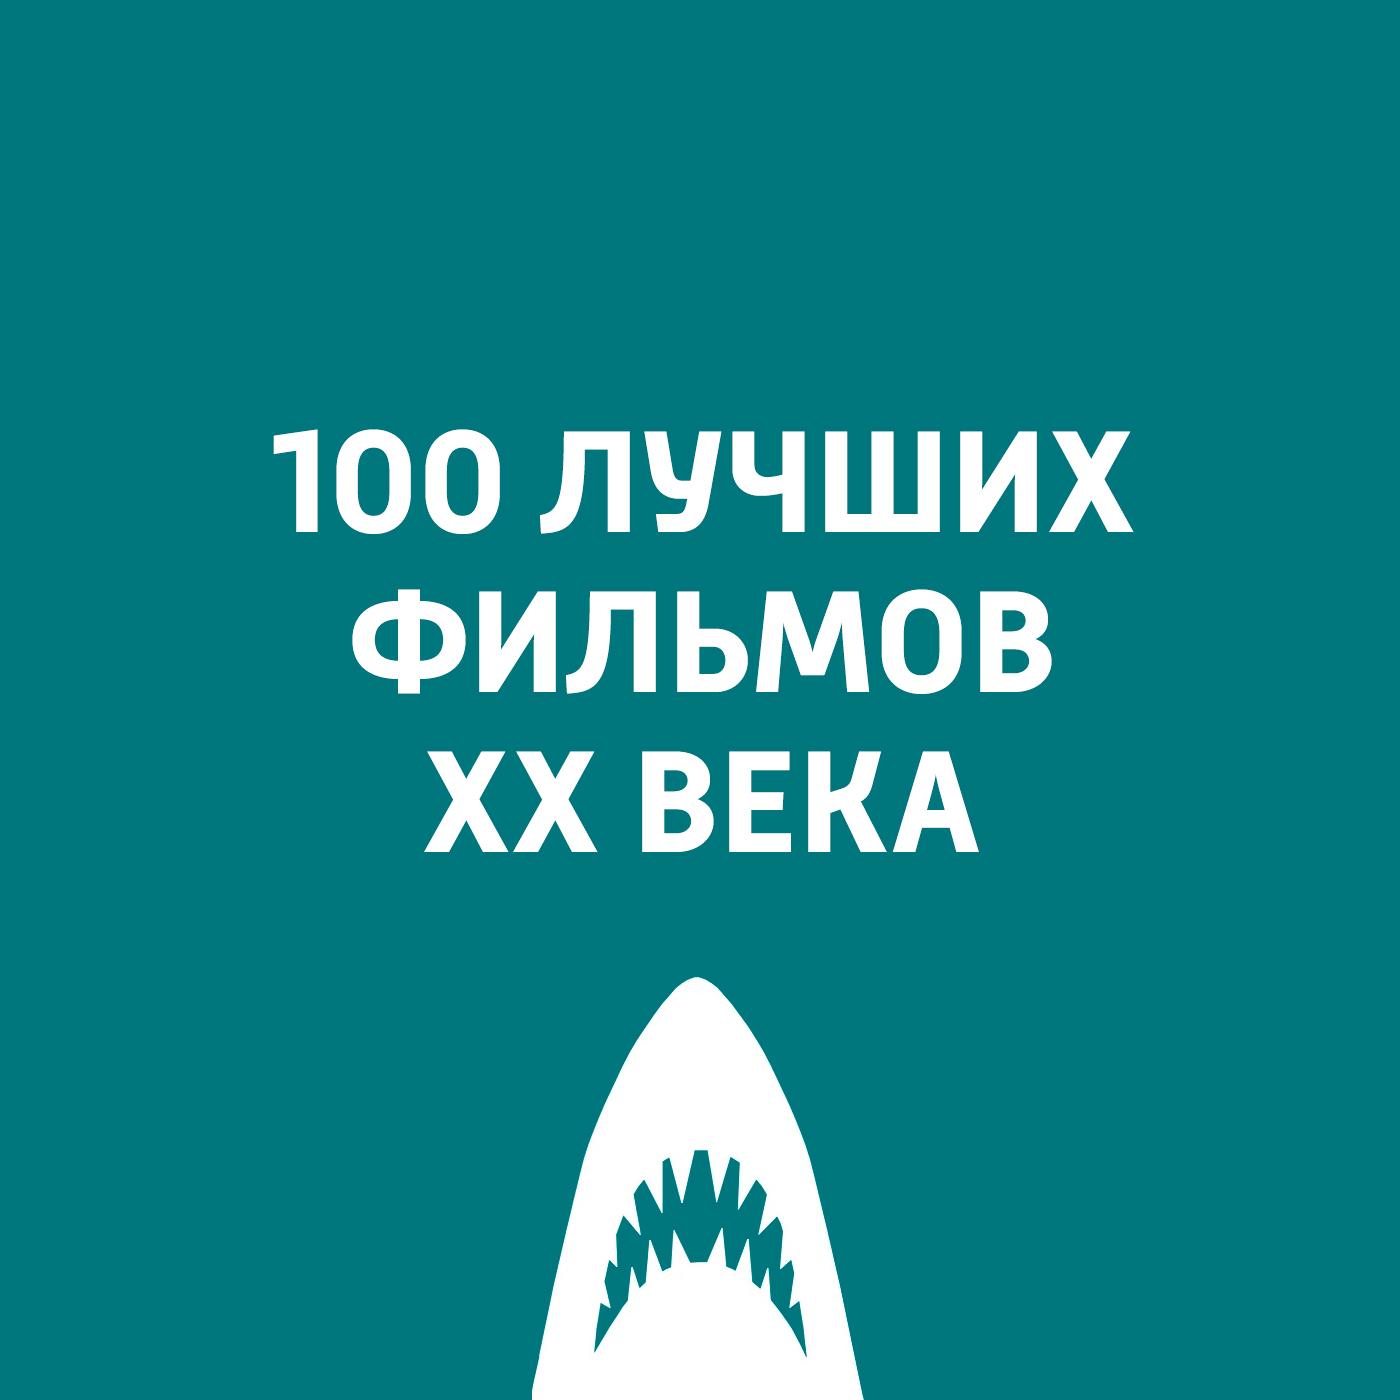 Антон Долин Слово антон долин спор петра и антона о фильме дюнкерк